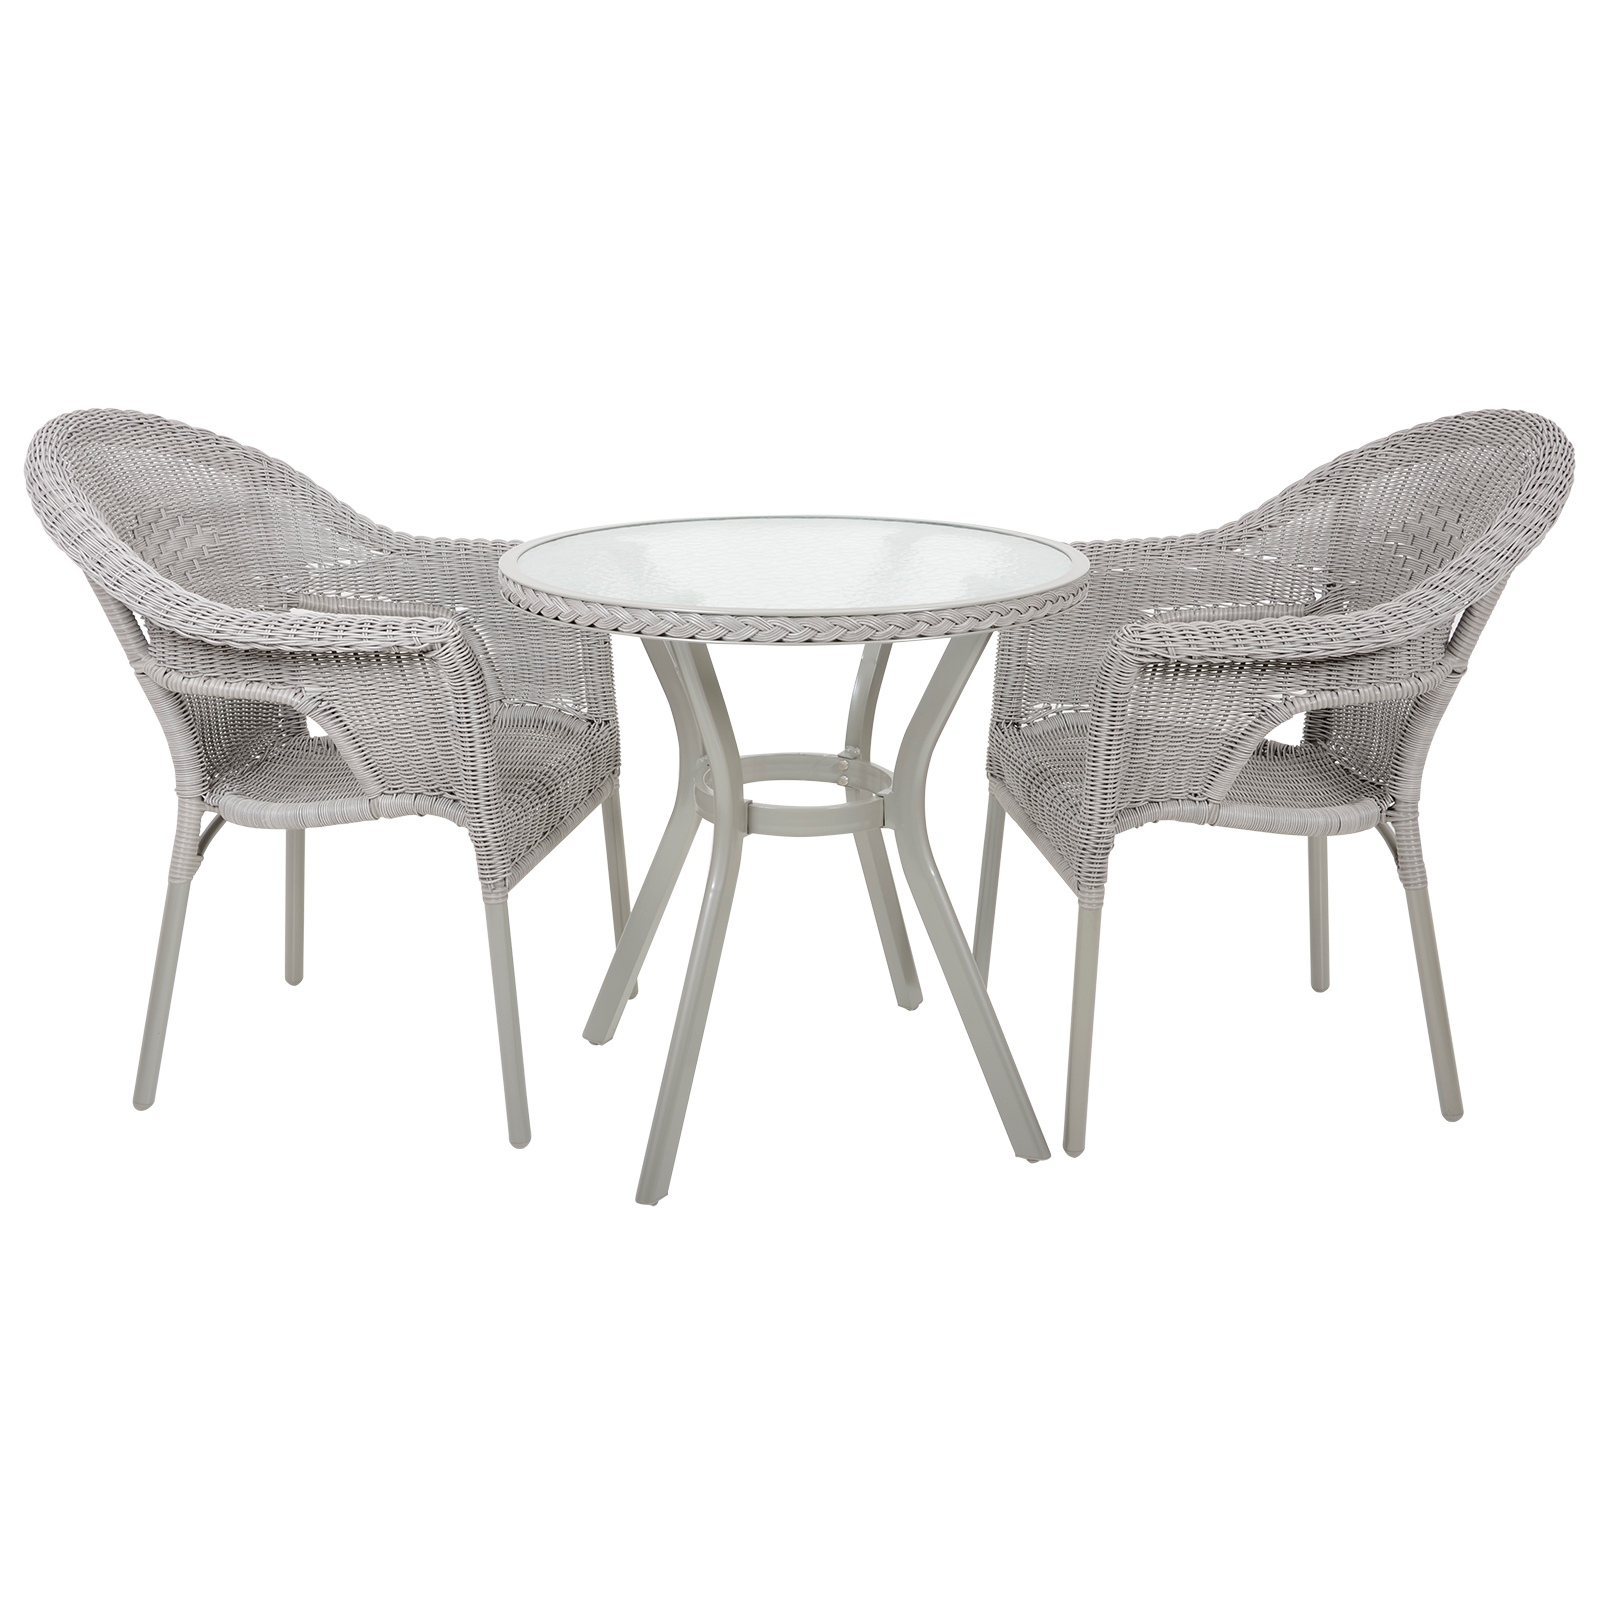 Havana rattan wicker bistro 2 seat garden patio furniture for 108 table seats how many